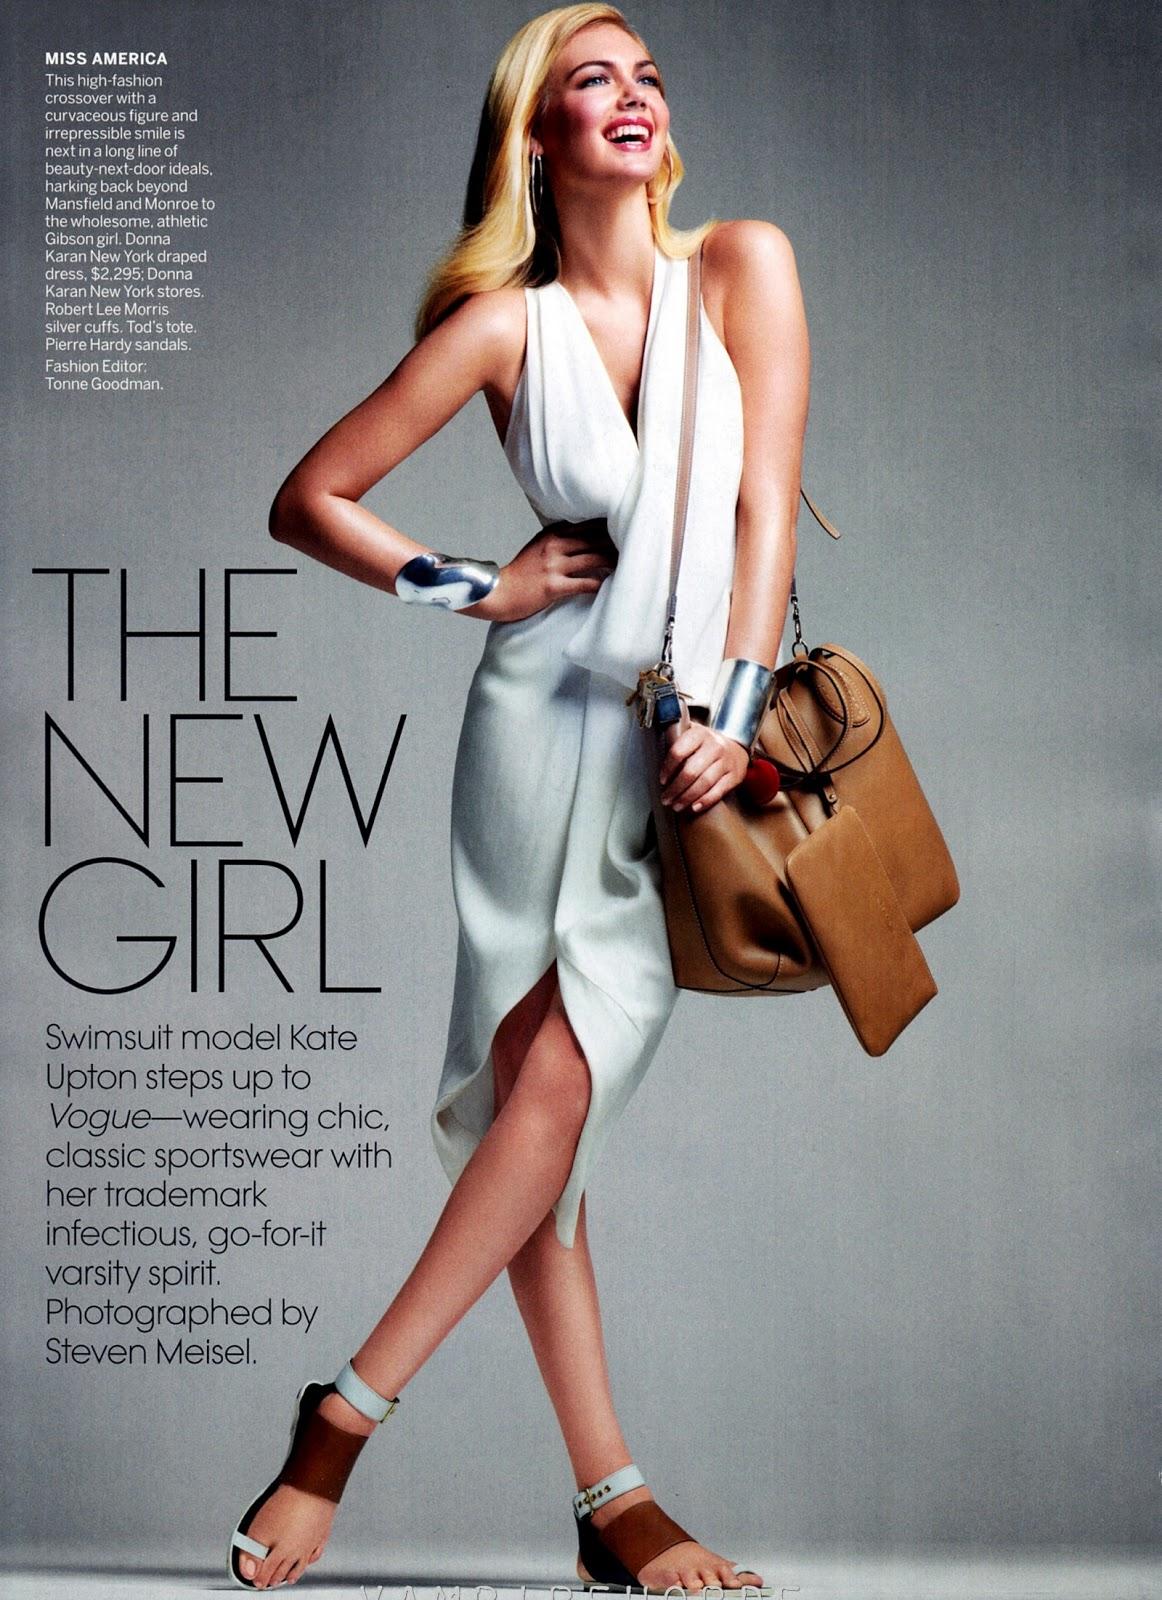 http://2.bp.blogspot.com/-ISe8clSfQco/UJFLGkiHpZI/AAAAAAAASUM/8U3EpIi6bMQ/s1600/Kate+Upton+-+Vogue+Magazine+November+2012-+1.jpg